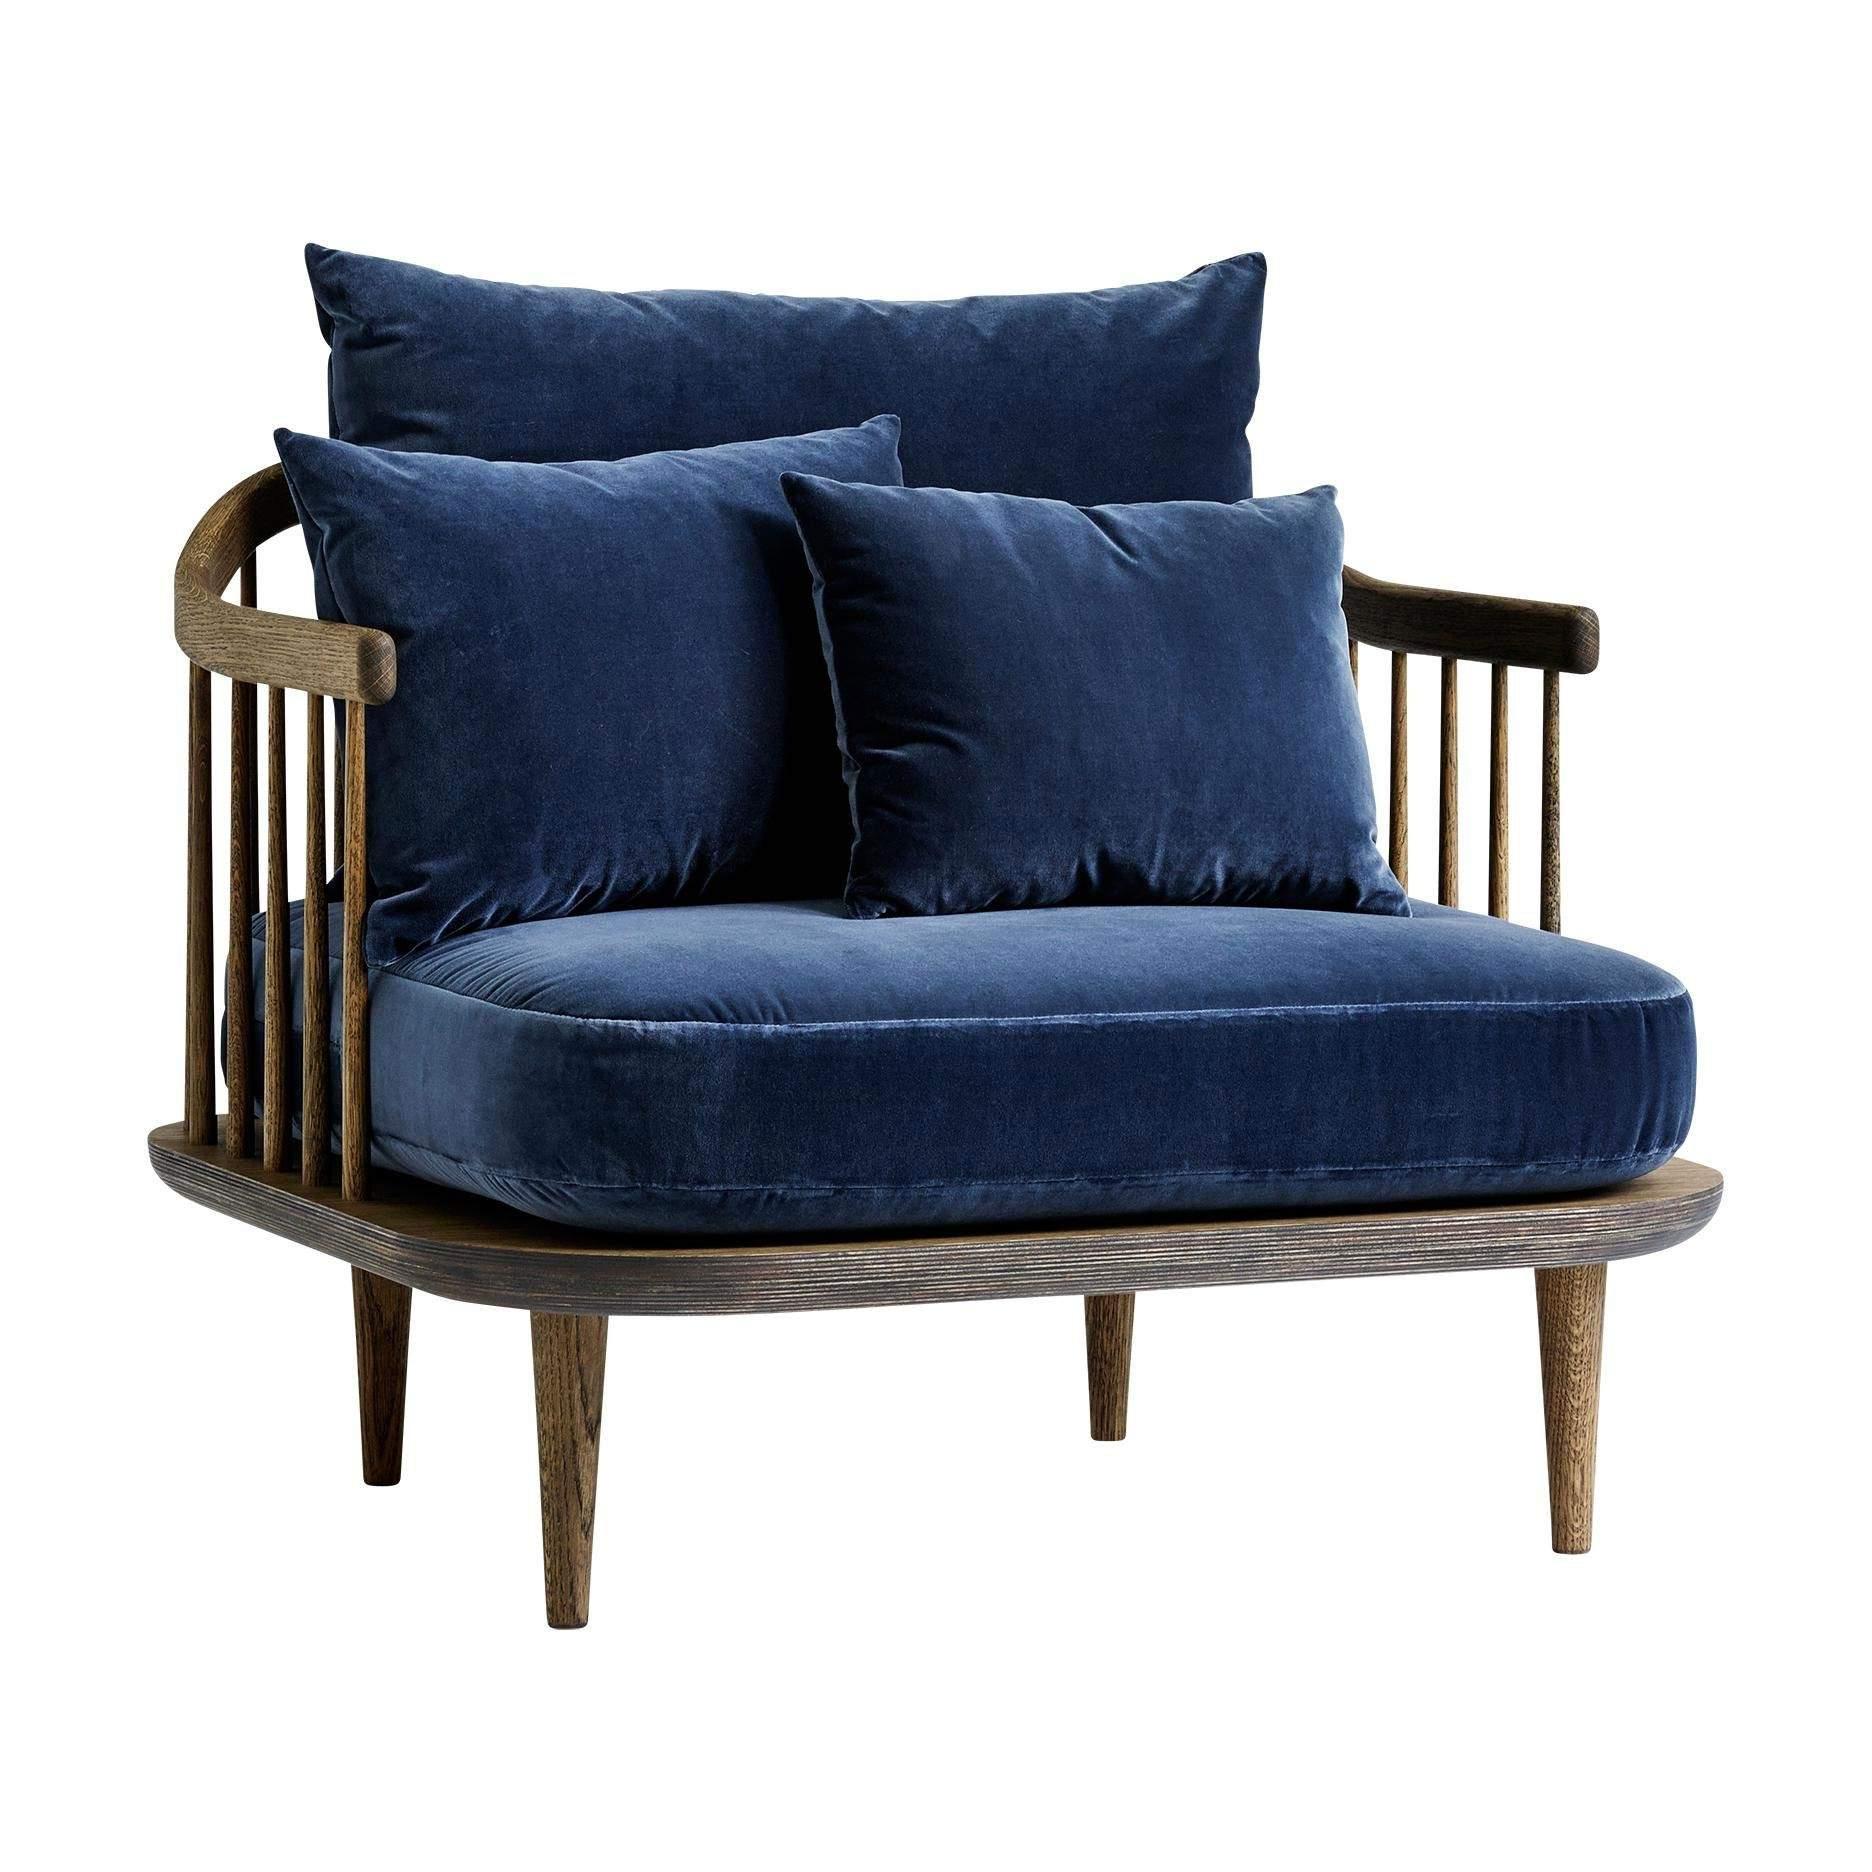 AndTradition FLY Chair SC1 Sessel 1872x1872 ID 39e106fe0ec a88b2f1ba4b1cd4f